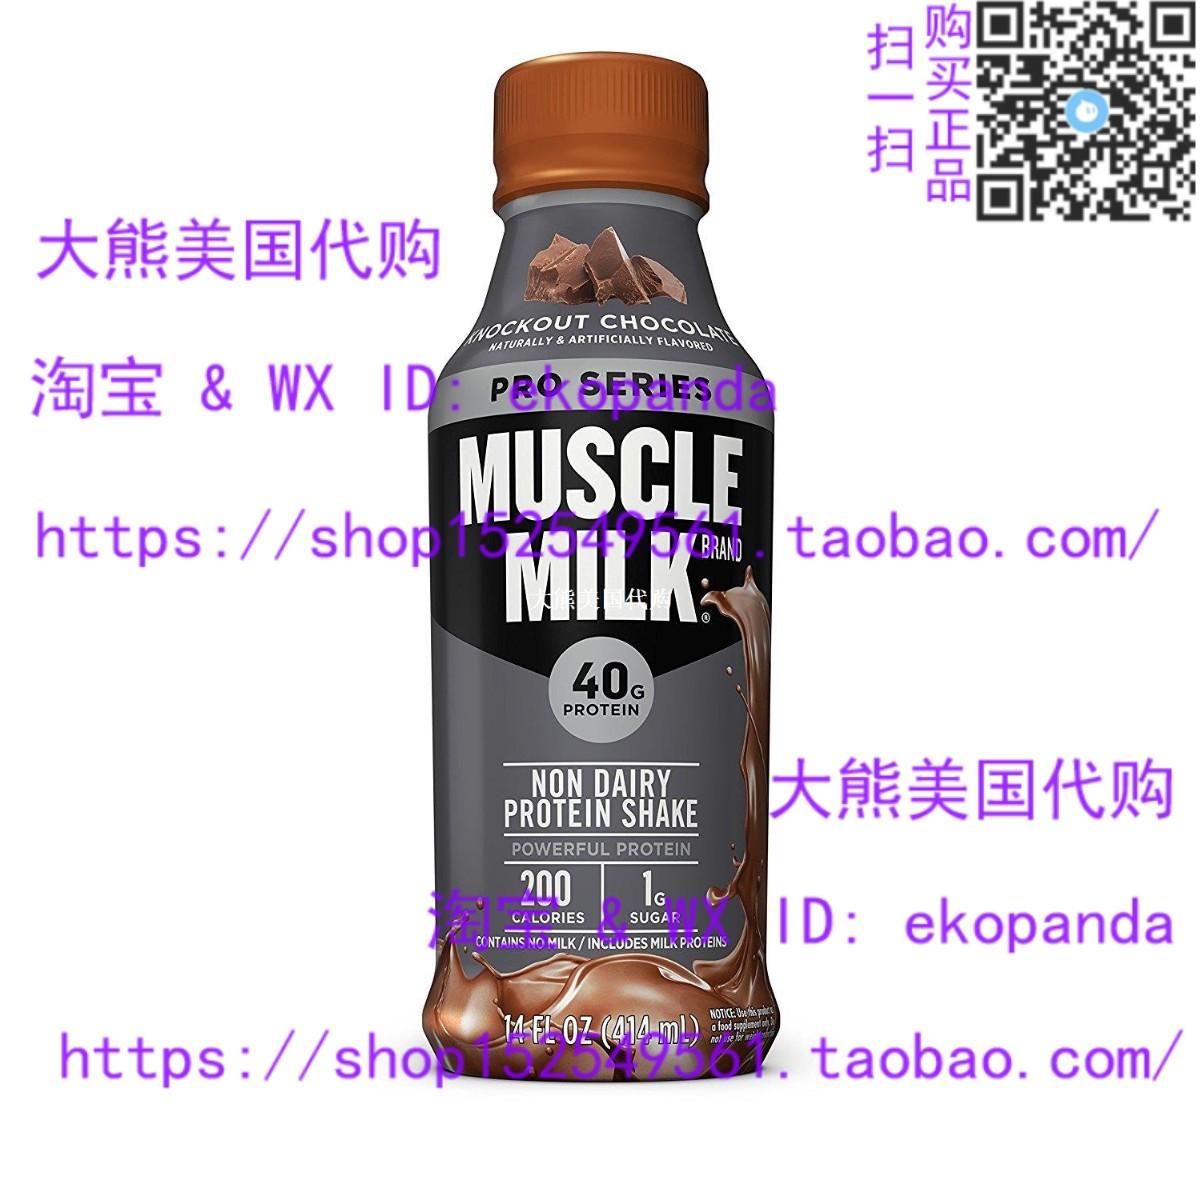 Muscle Milk Pro Series Protein Shake, Chocolate, 12CT / 12 филиал